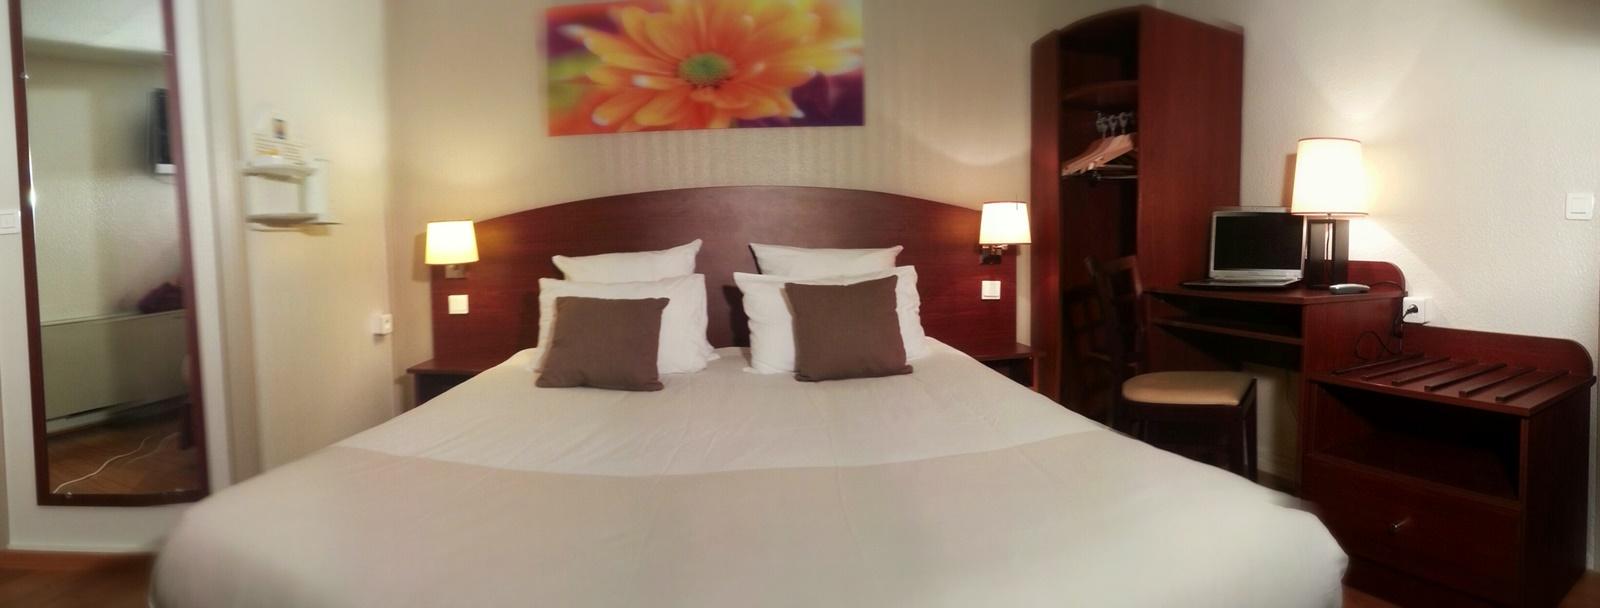 Comfort-hotel-Cachan-1